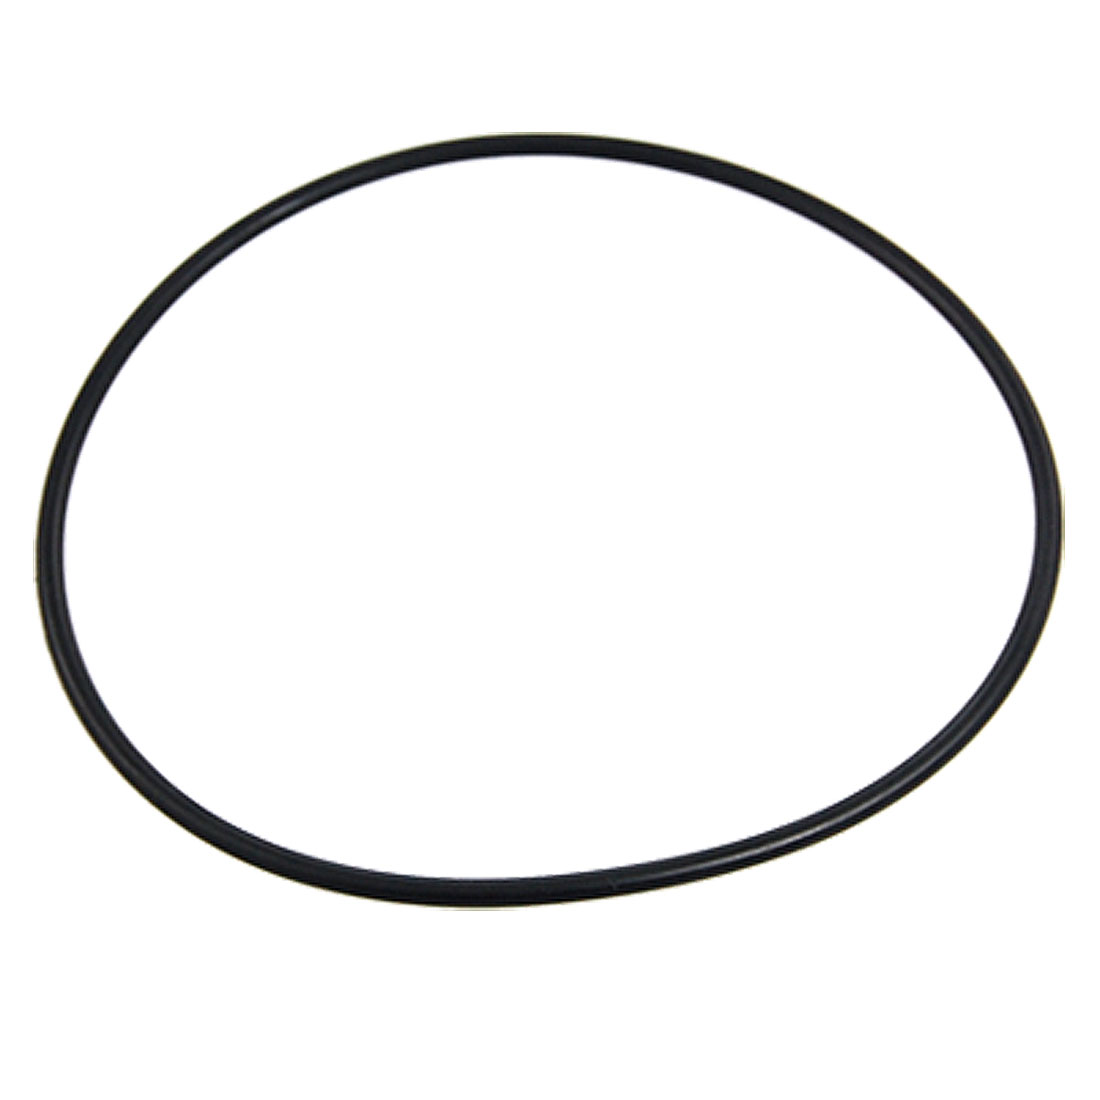 Black 190mm External Diameter Rubber Oil Seal O Ring Gasket